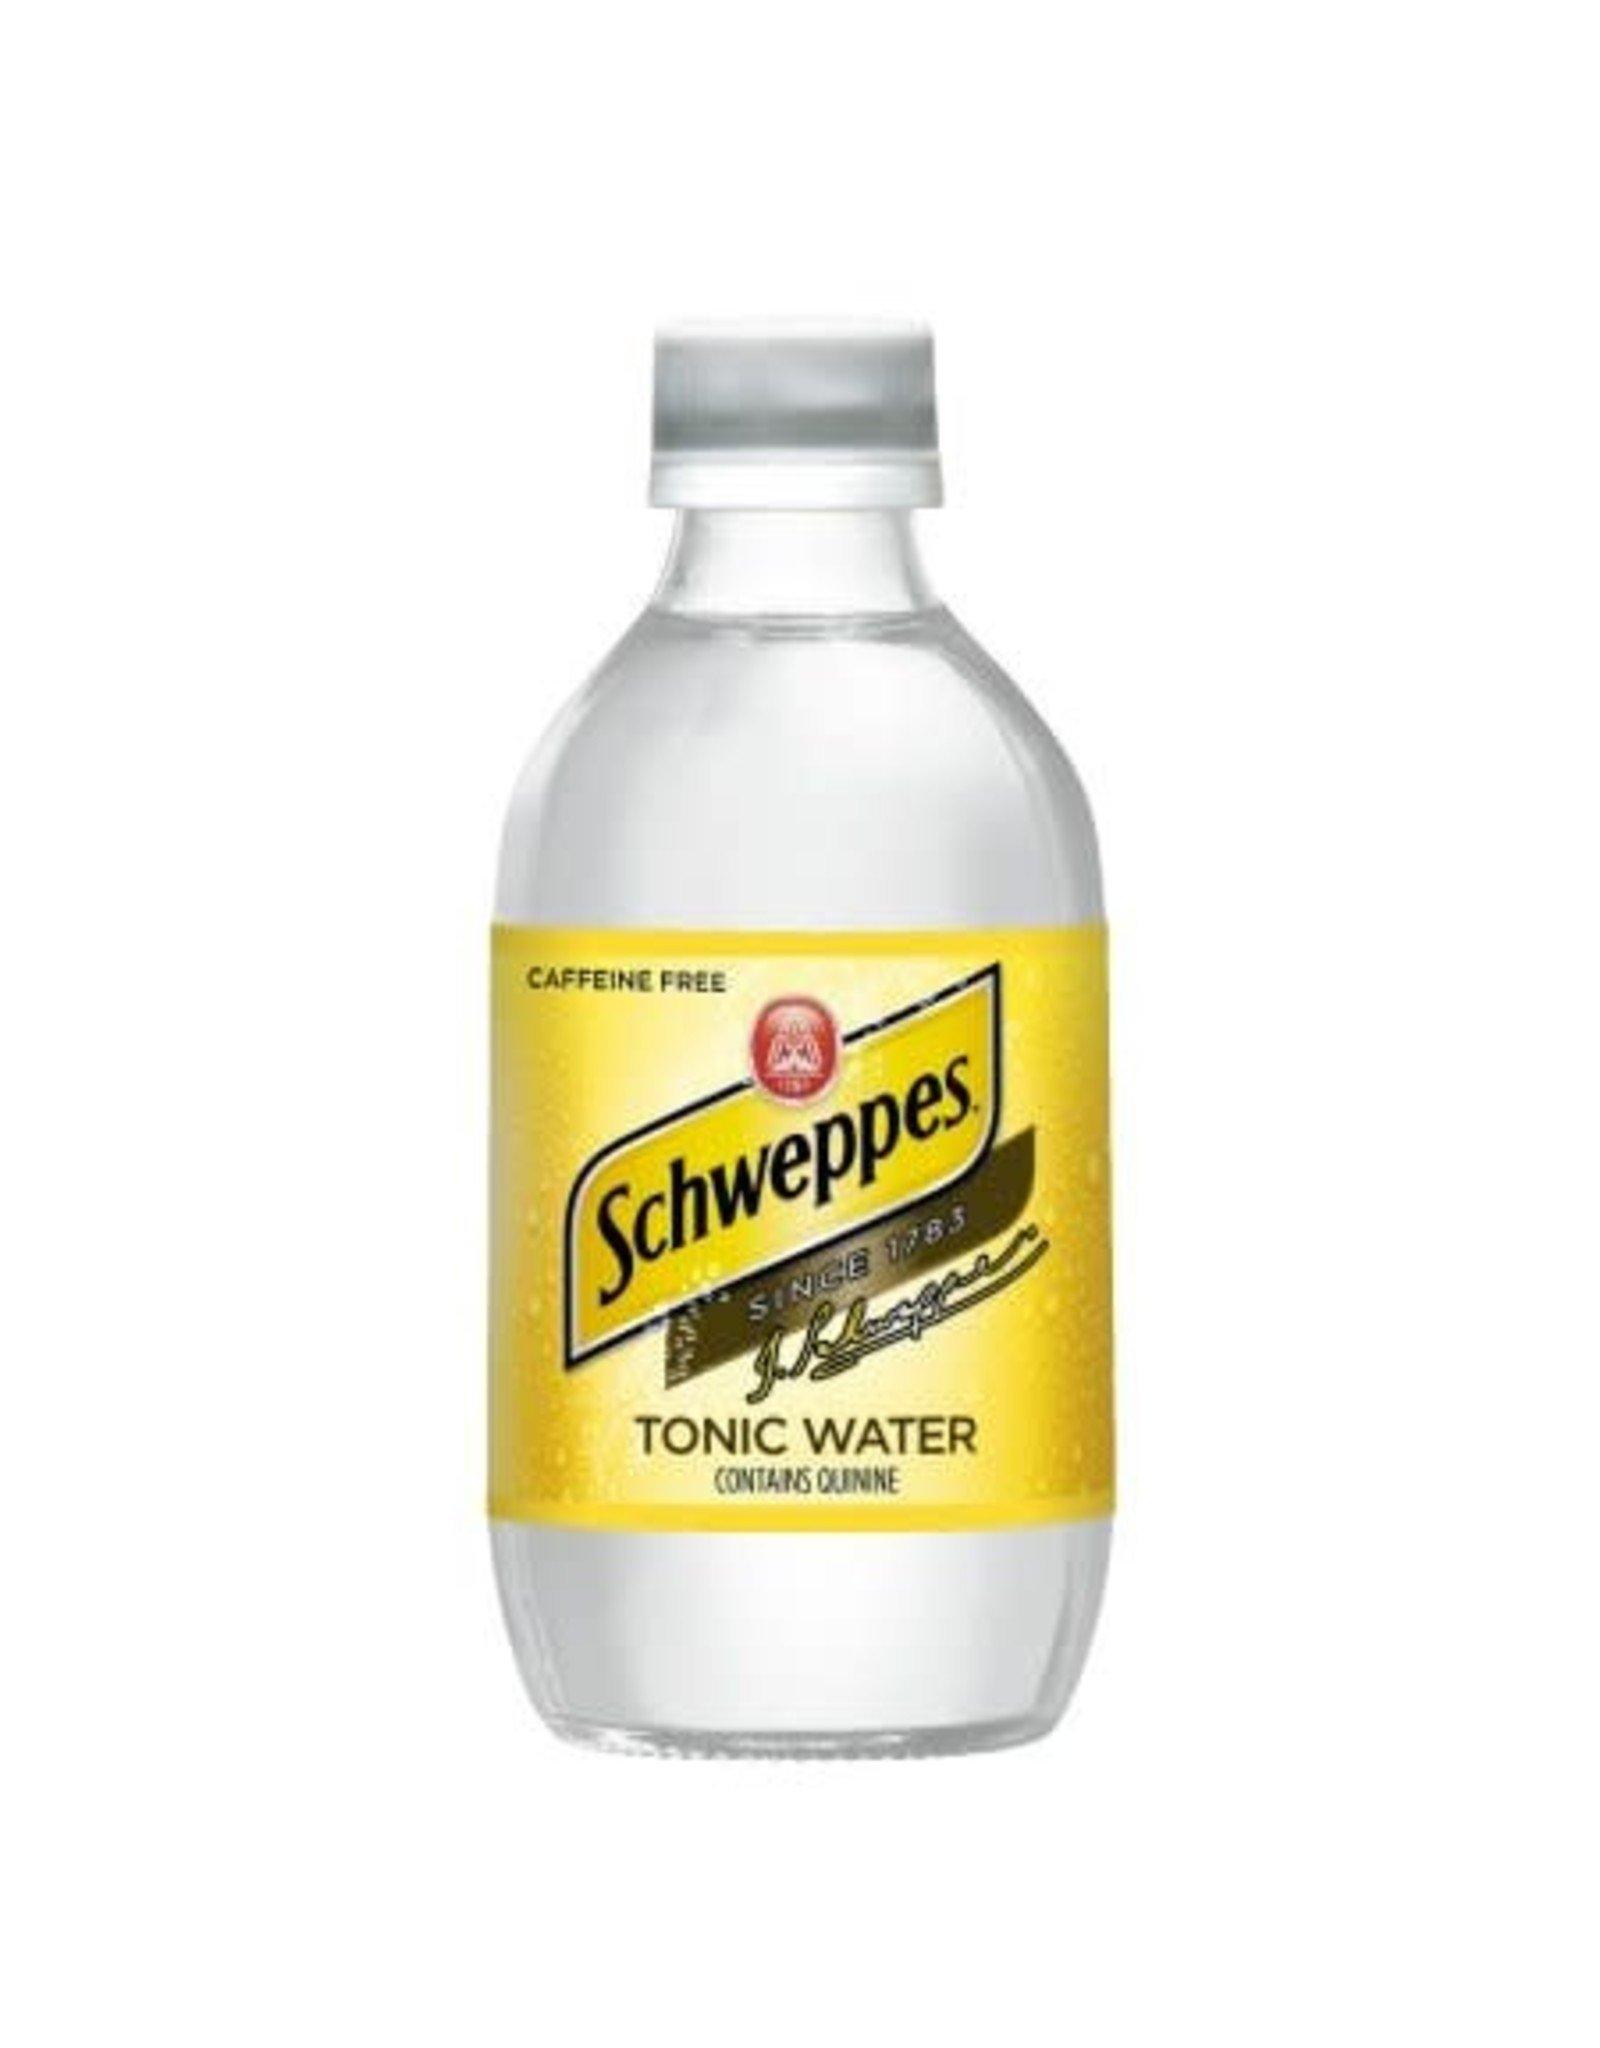 SCHWEPPES TONIC WATER 10 OZ